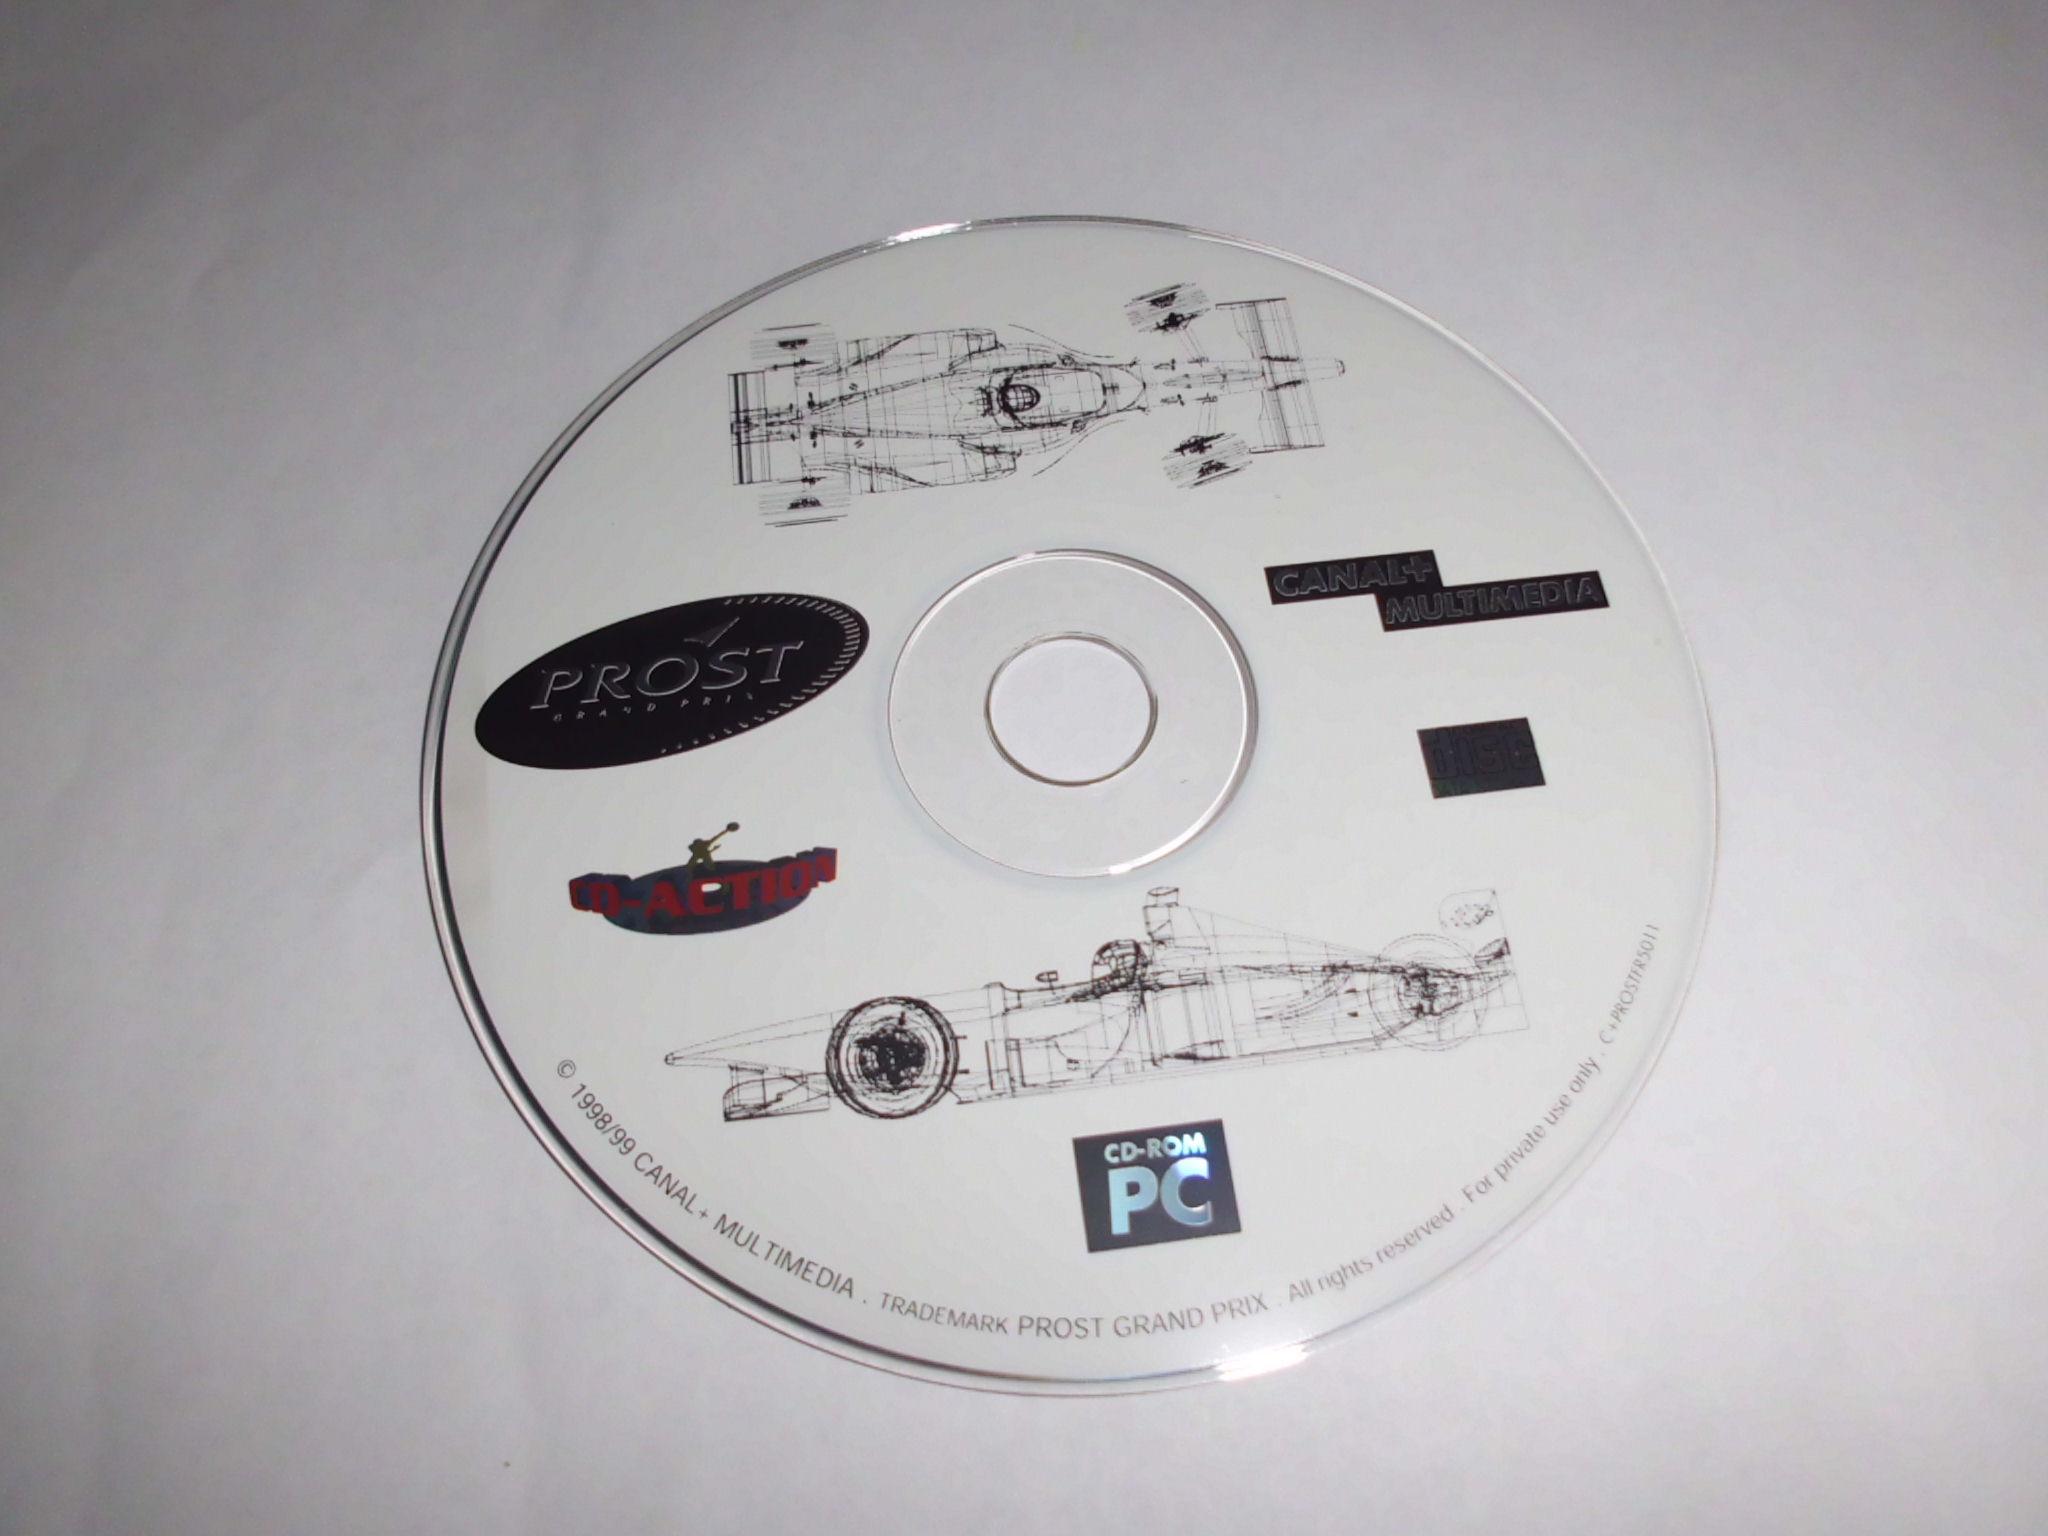 PROST GRAND PRIX (PC CD)